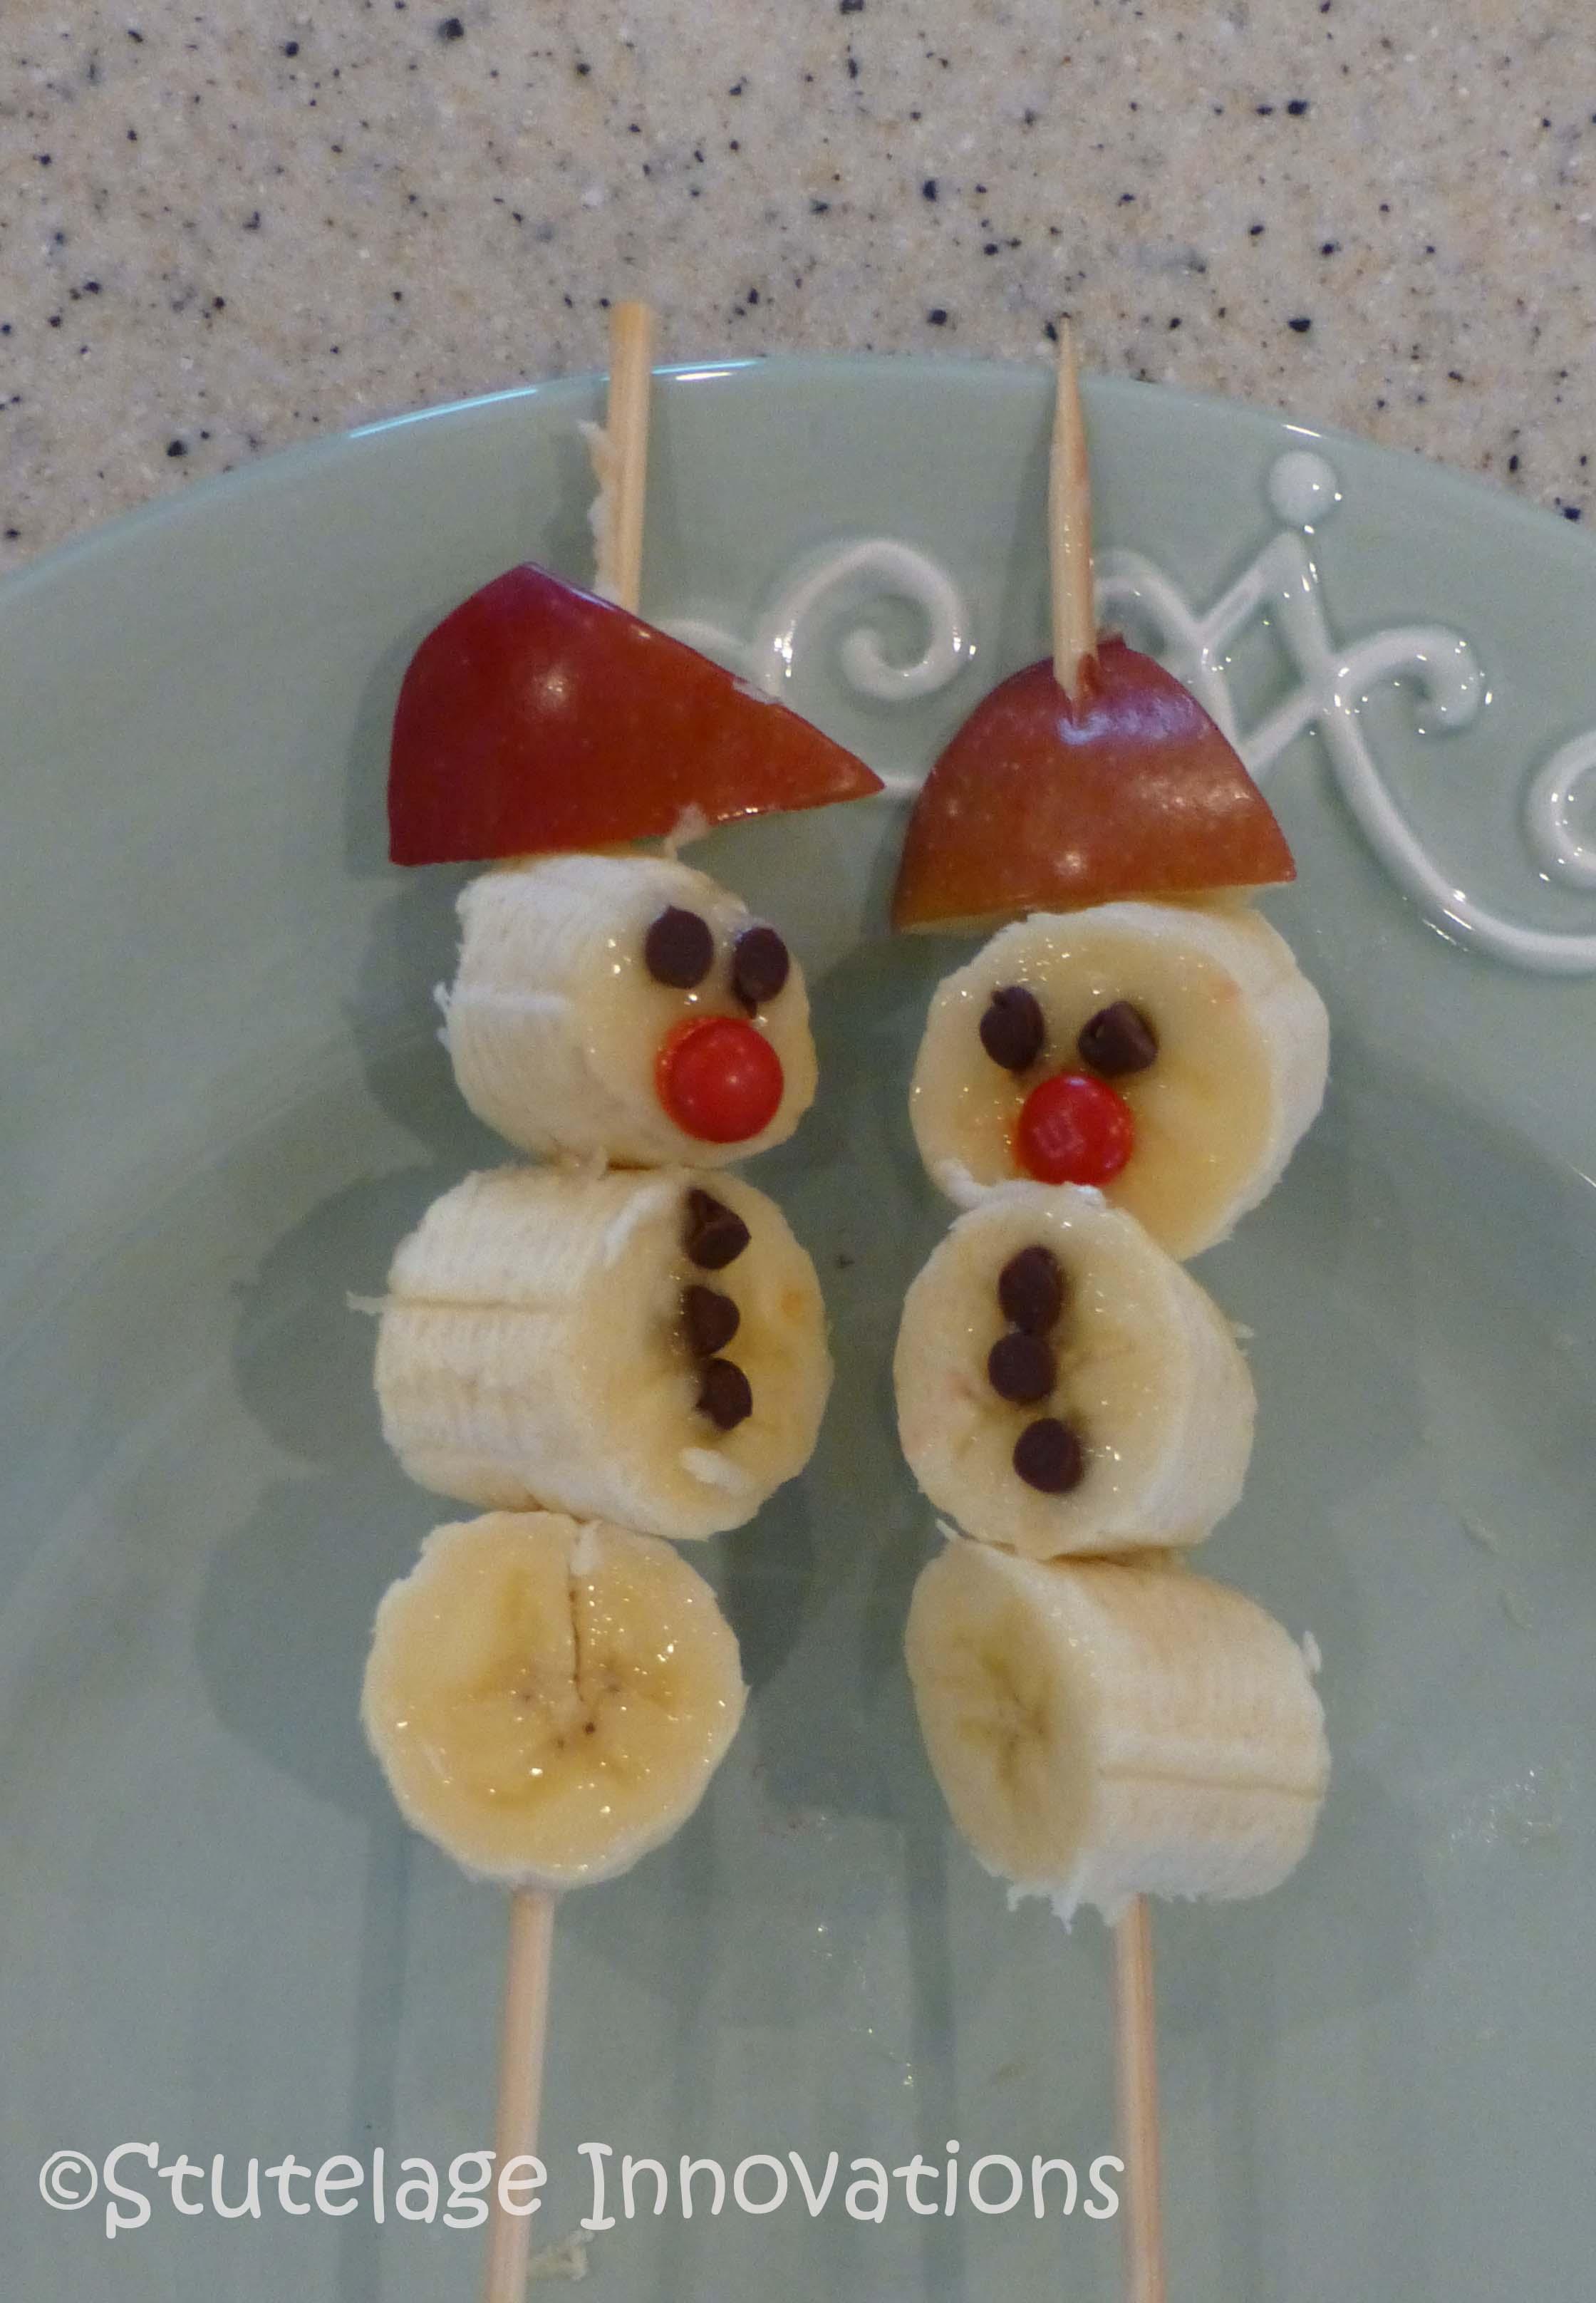 stutelage innovations    quick banana snowman snack